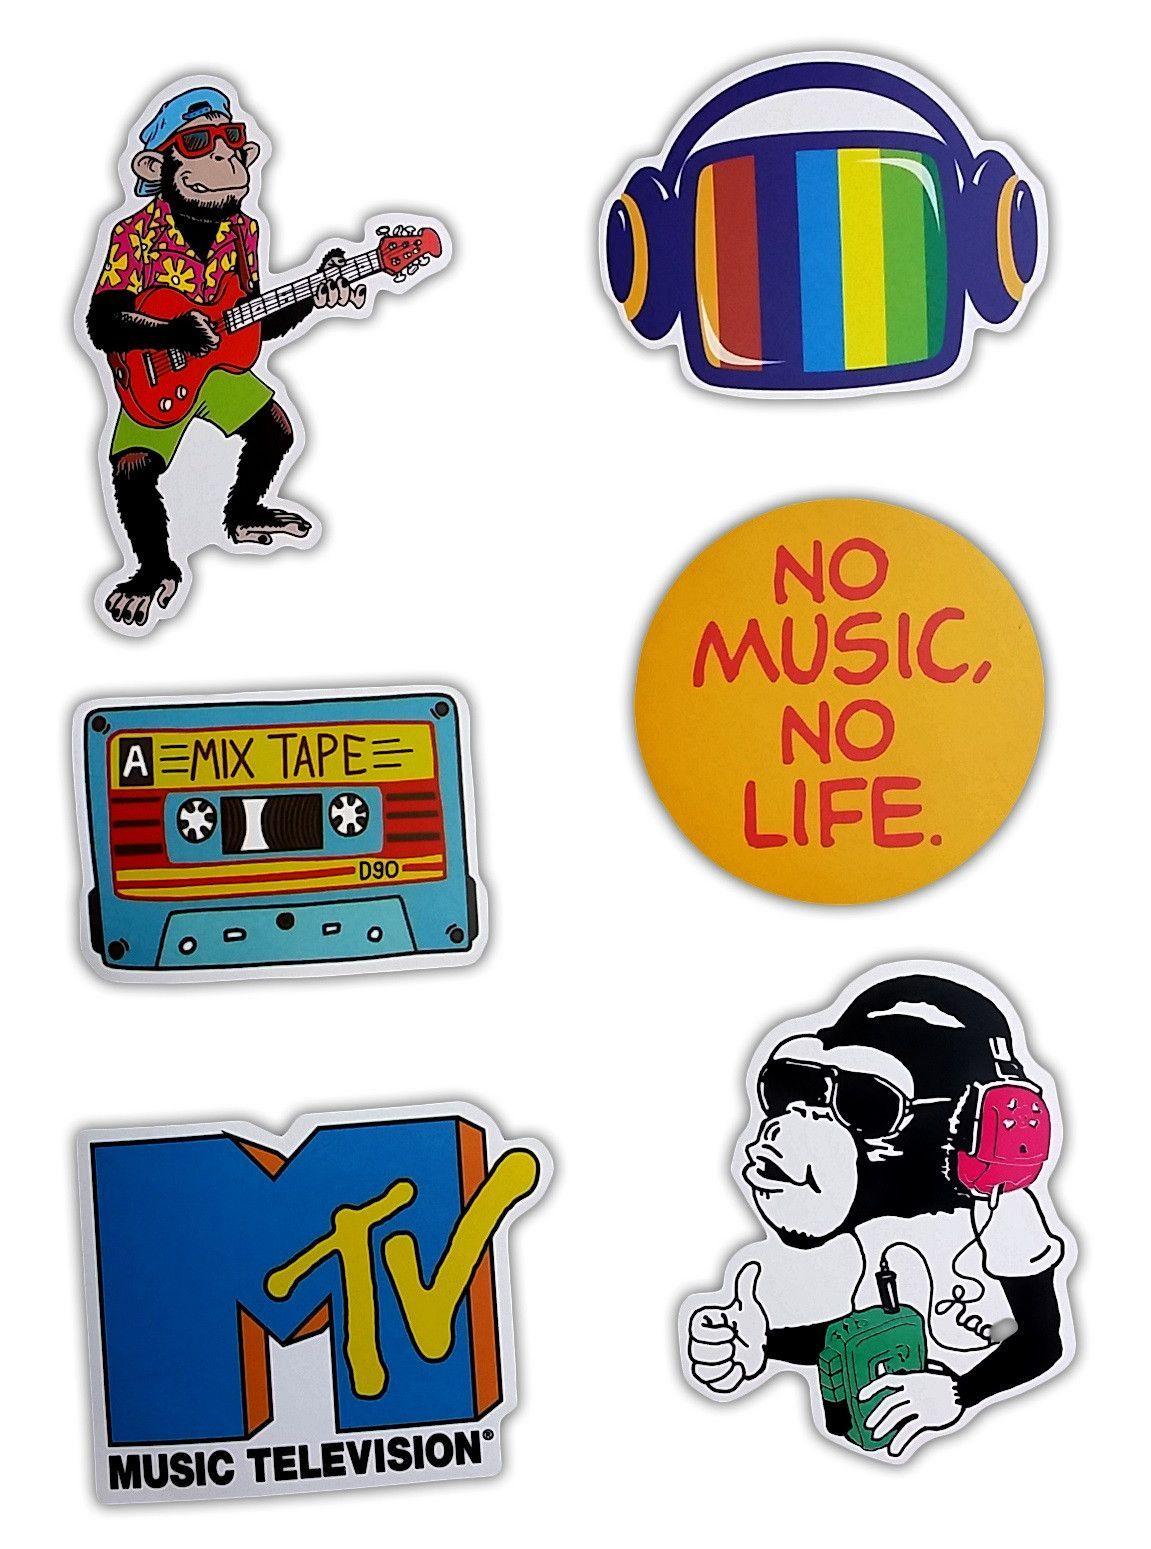 Mtv Music Skateboard Stickers Set Of 6 Stickers Macacos Adesivos [ jpg ]